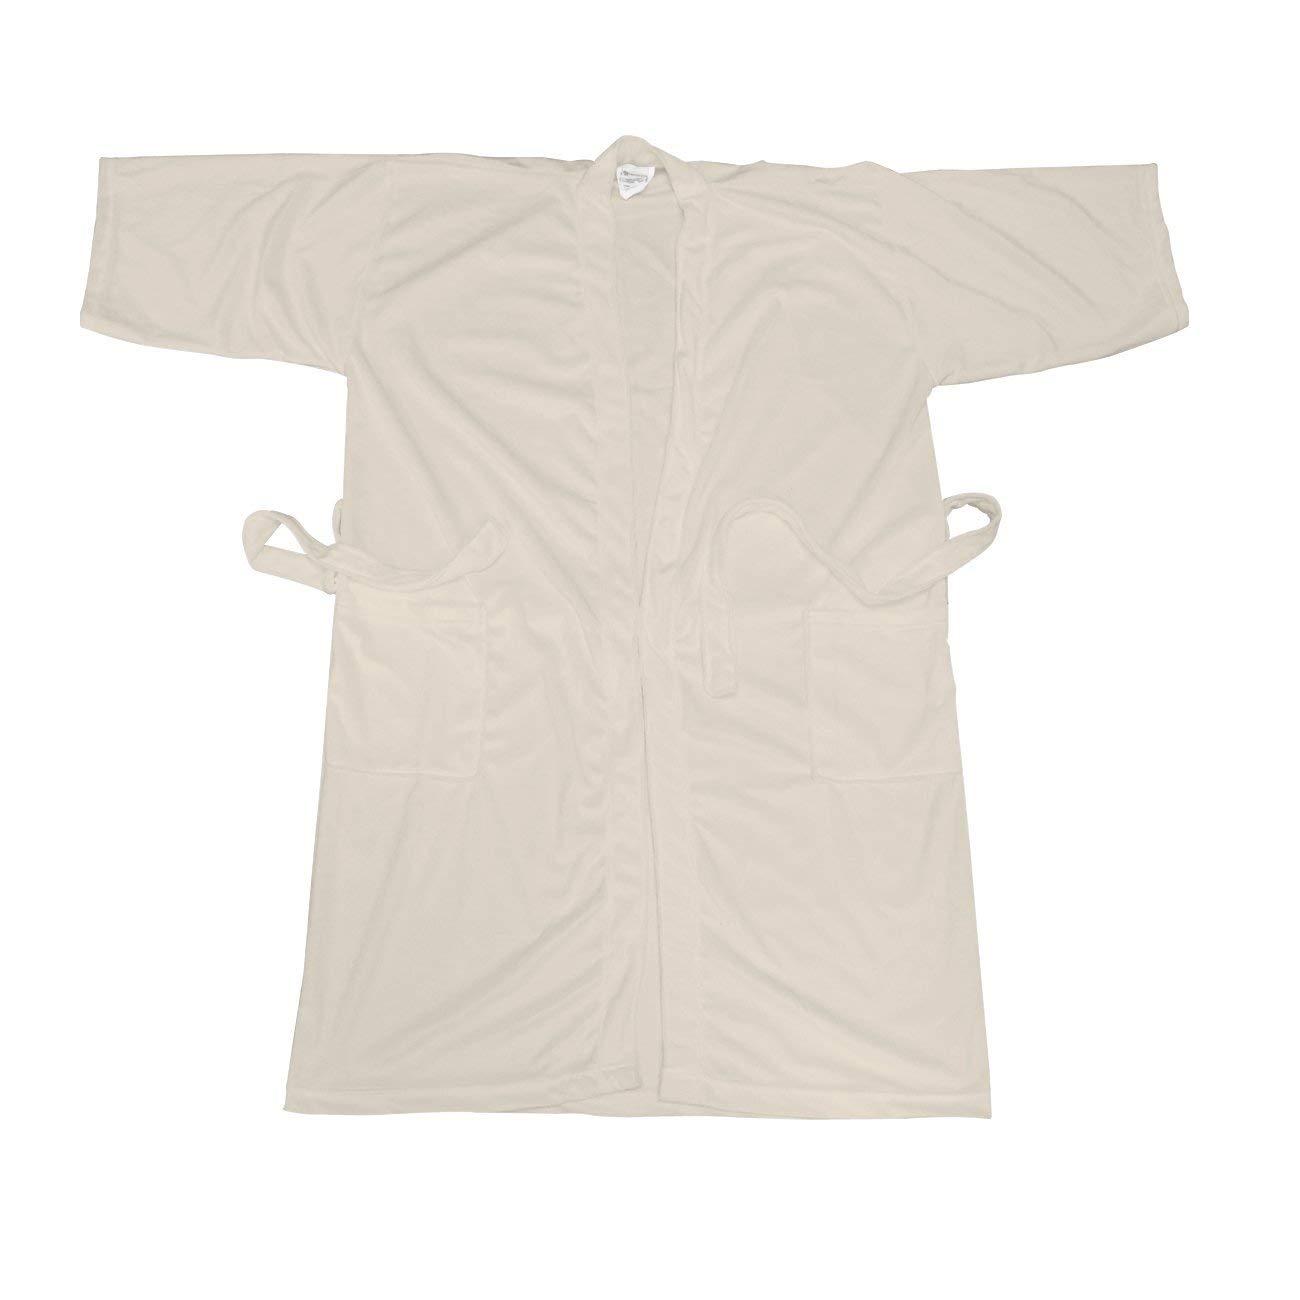 Canyon Rose Cloud 9 Women's Plush Microfiber Full Length Spa Robe, Soothing Sand, M/L